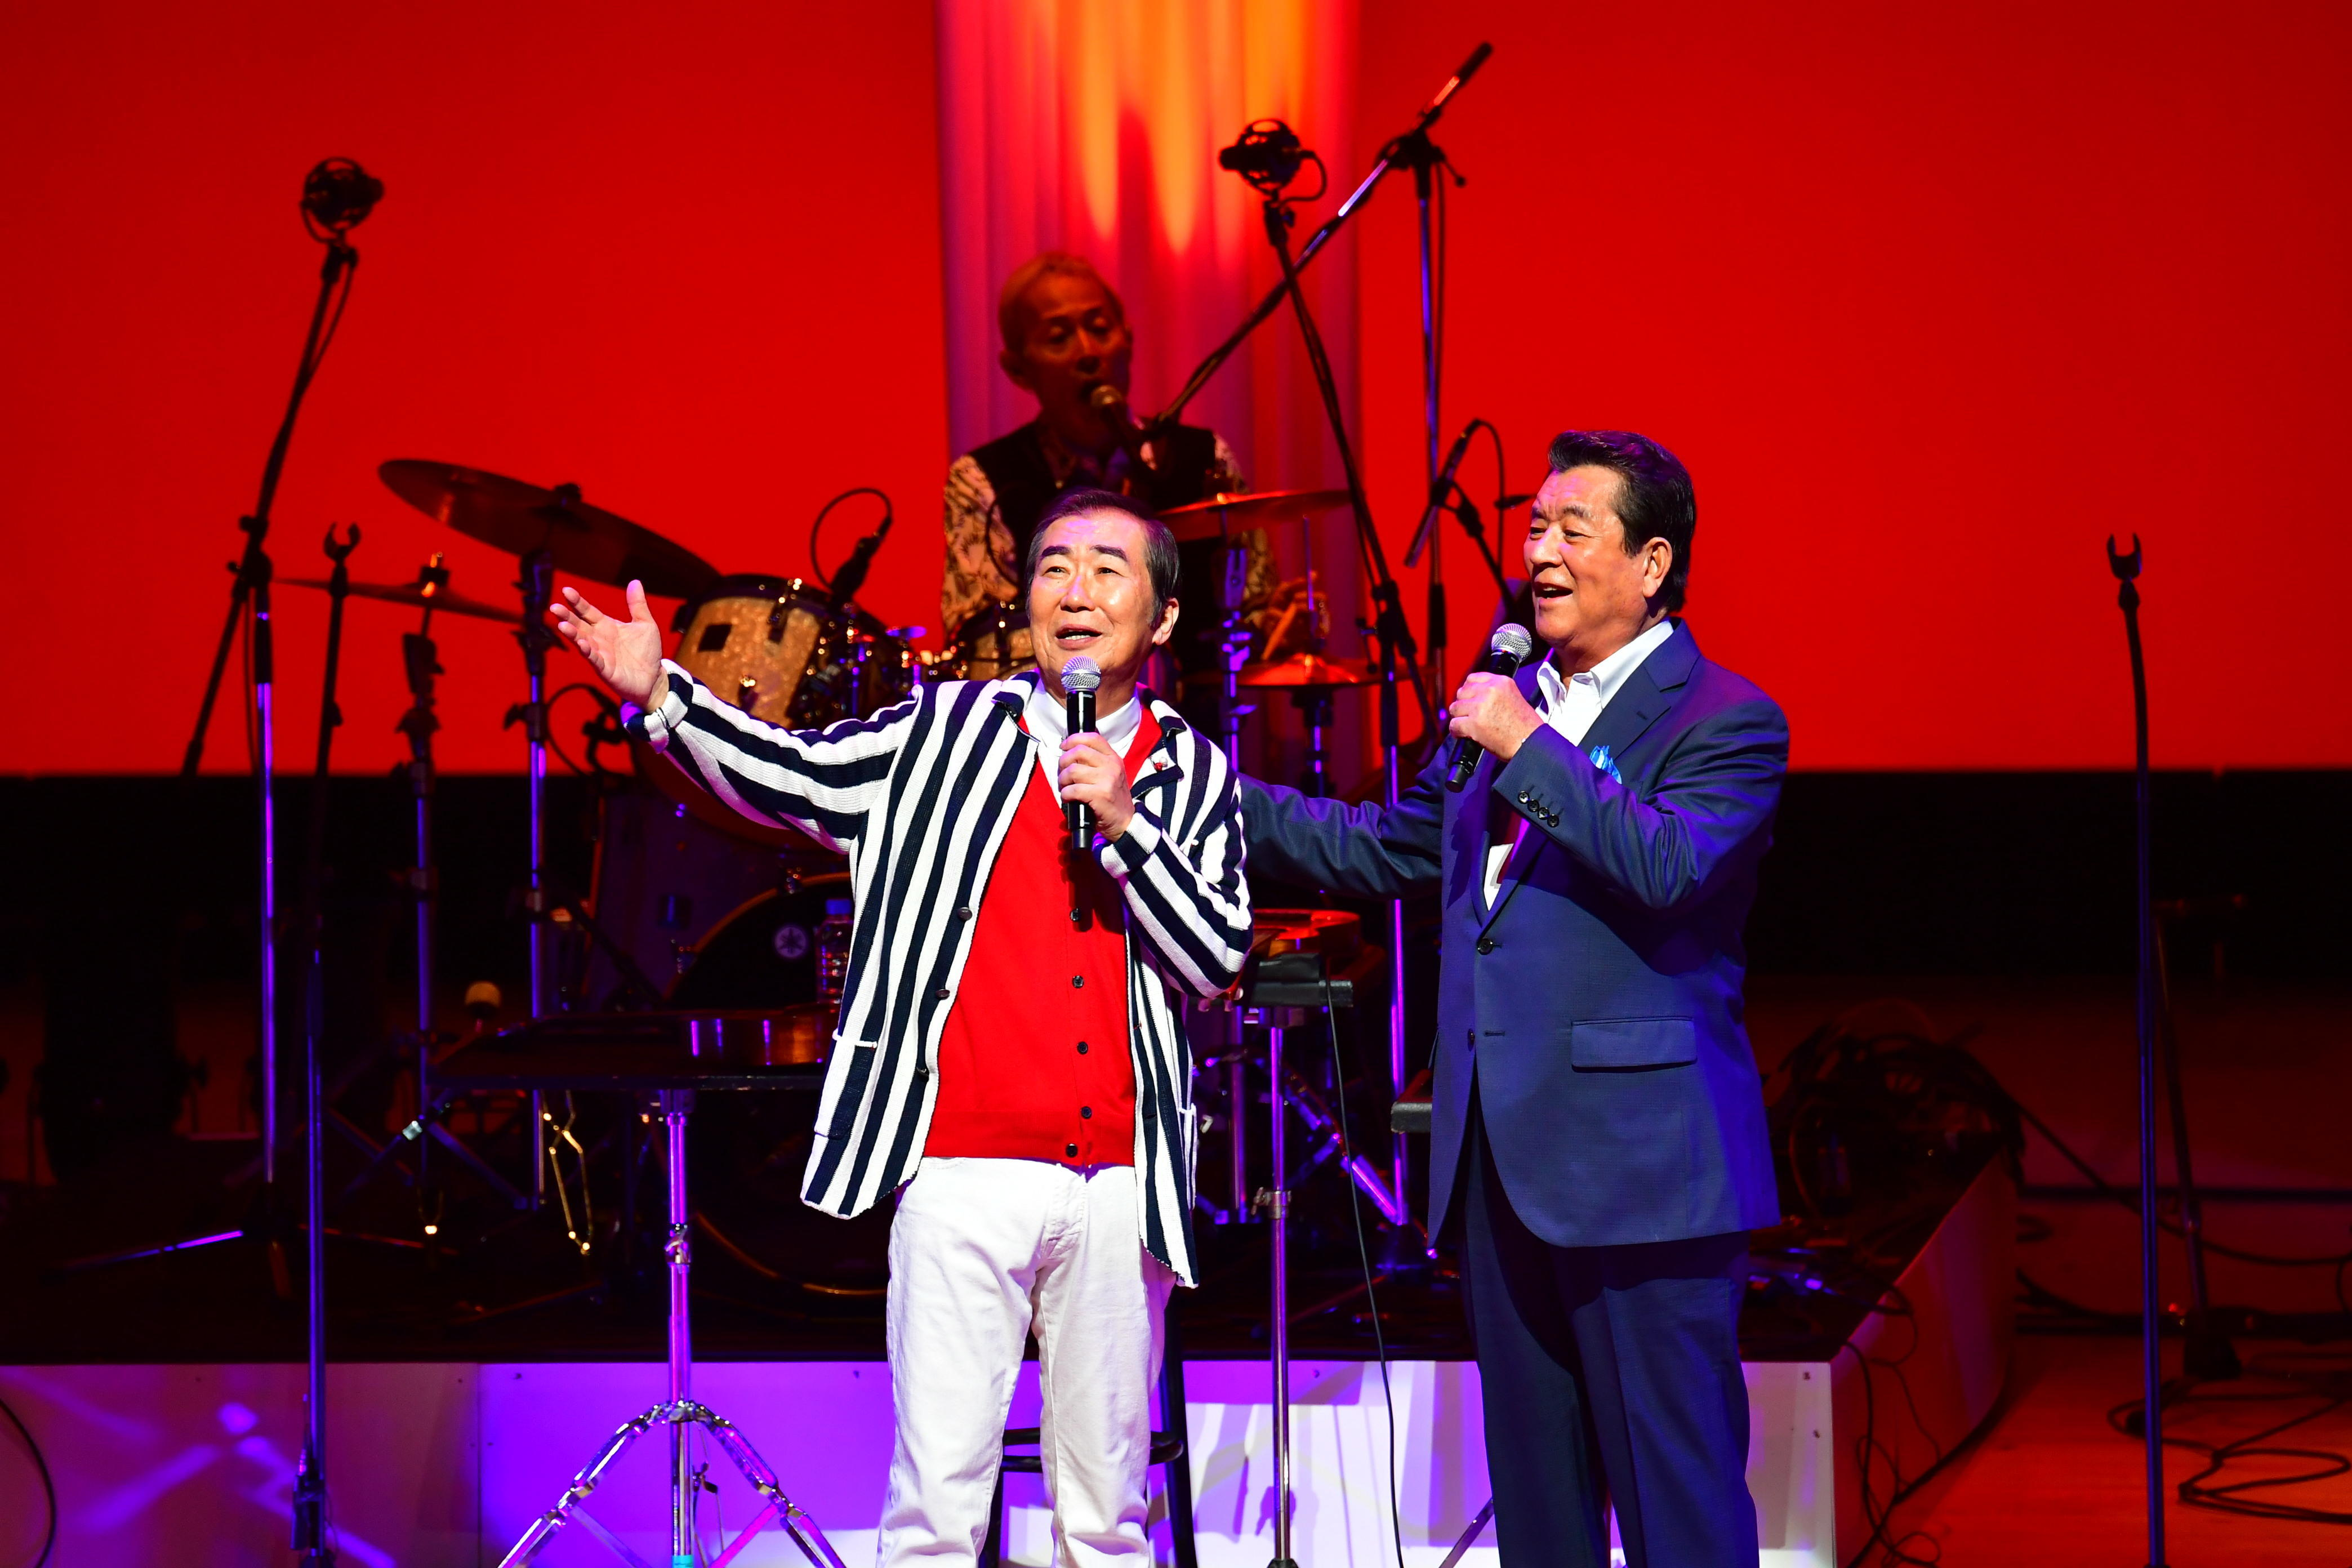 http://news.yoshimoto.co.jp/20171205152051-0964c3162448c9dc8f34756f2cad7be69d109179.jpg